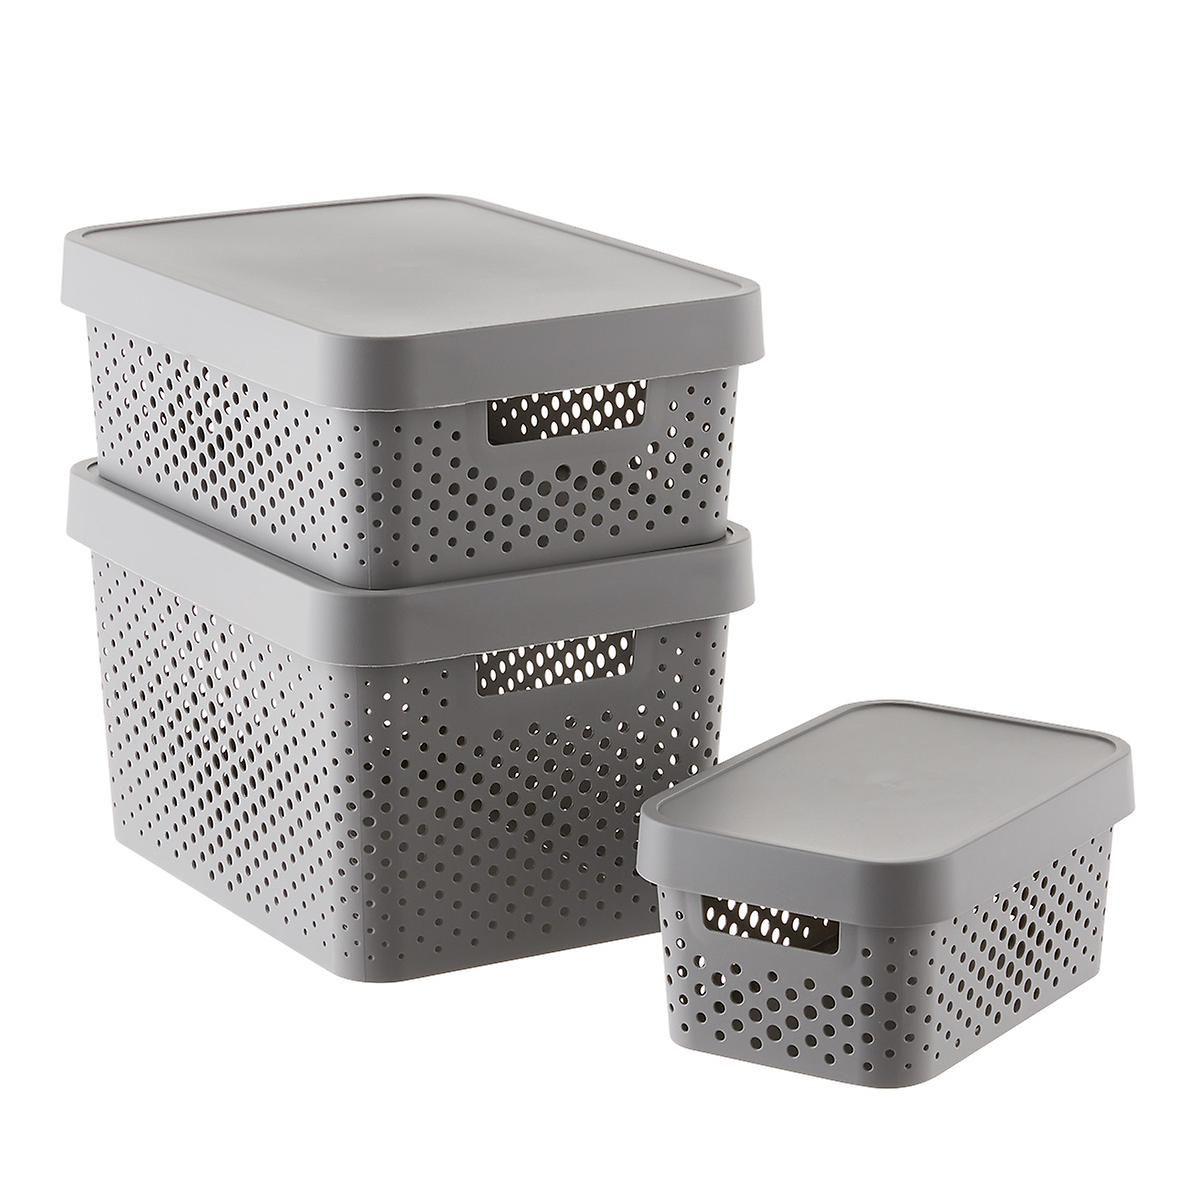 Curver Grey Infinity Plastic Storage Boxes With Lids Plastic Box